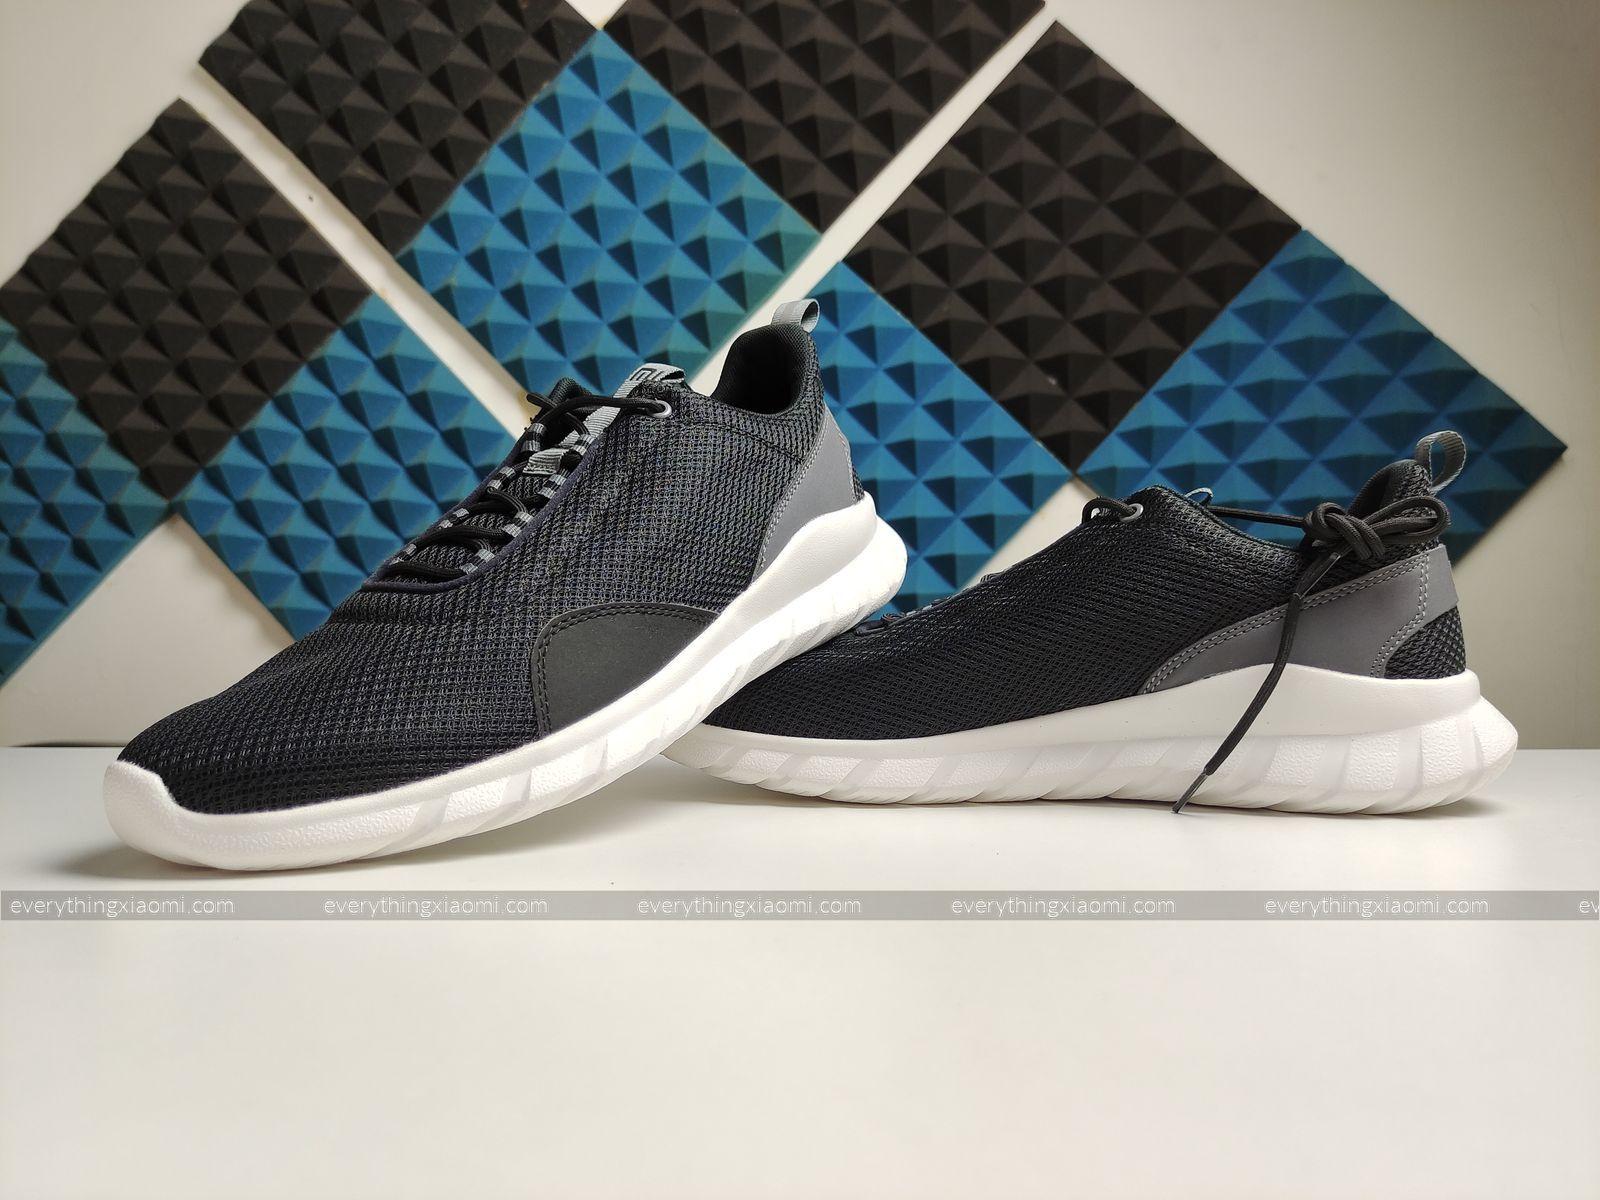 MI Athleisure shoes 3 result